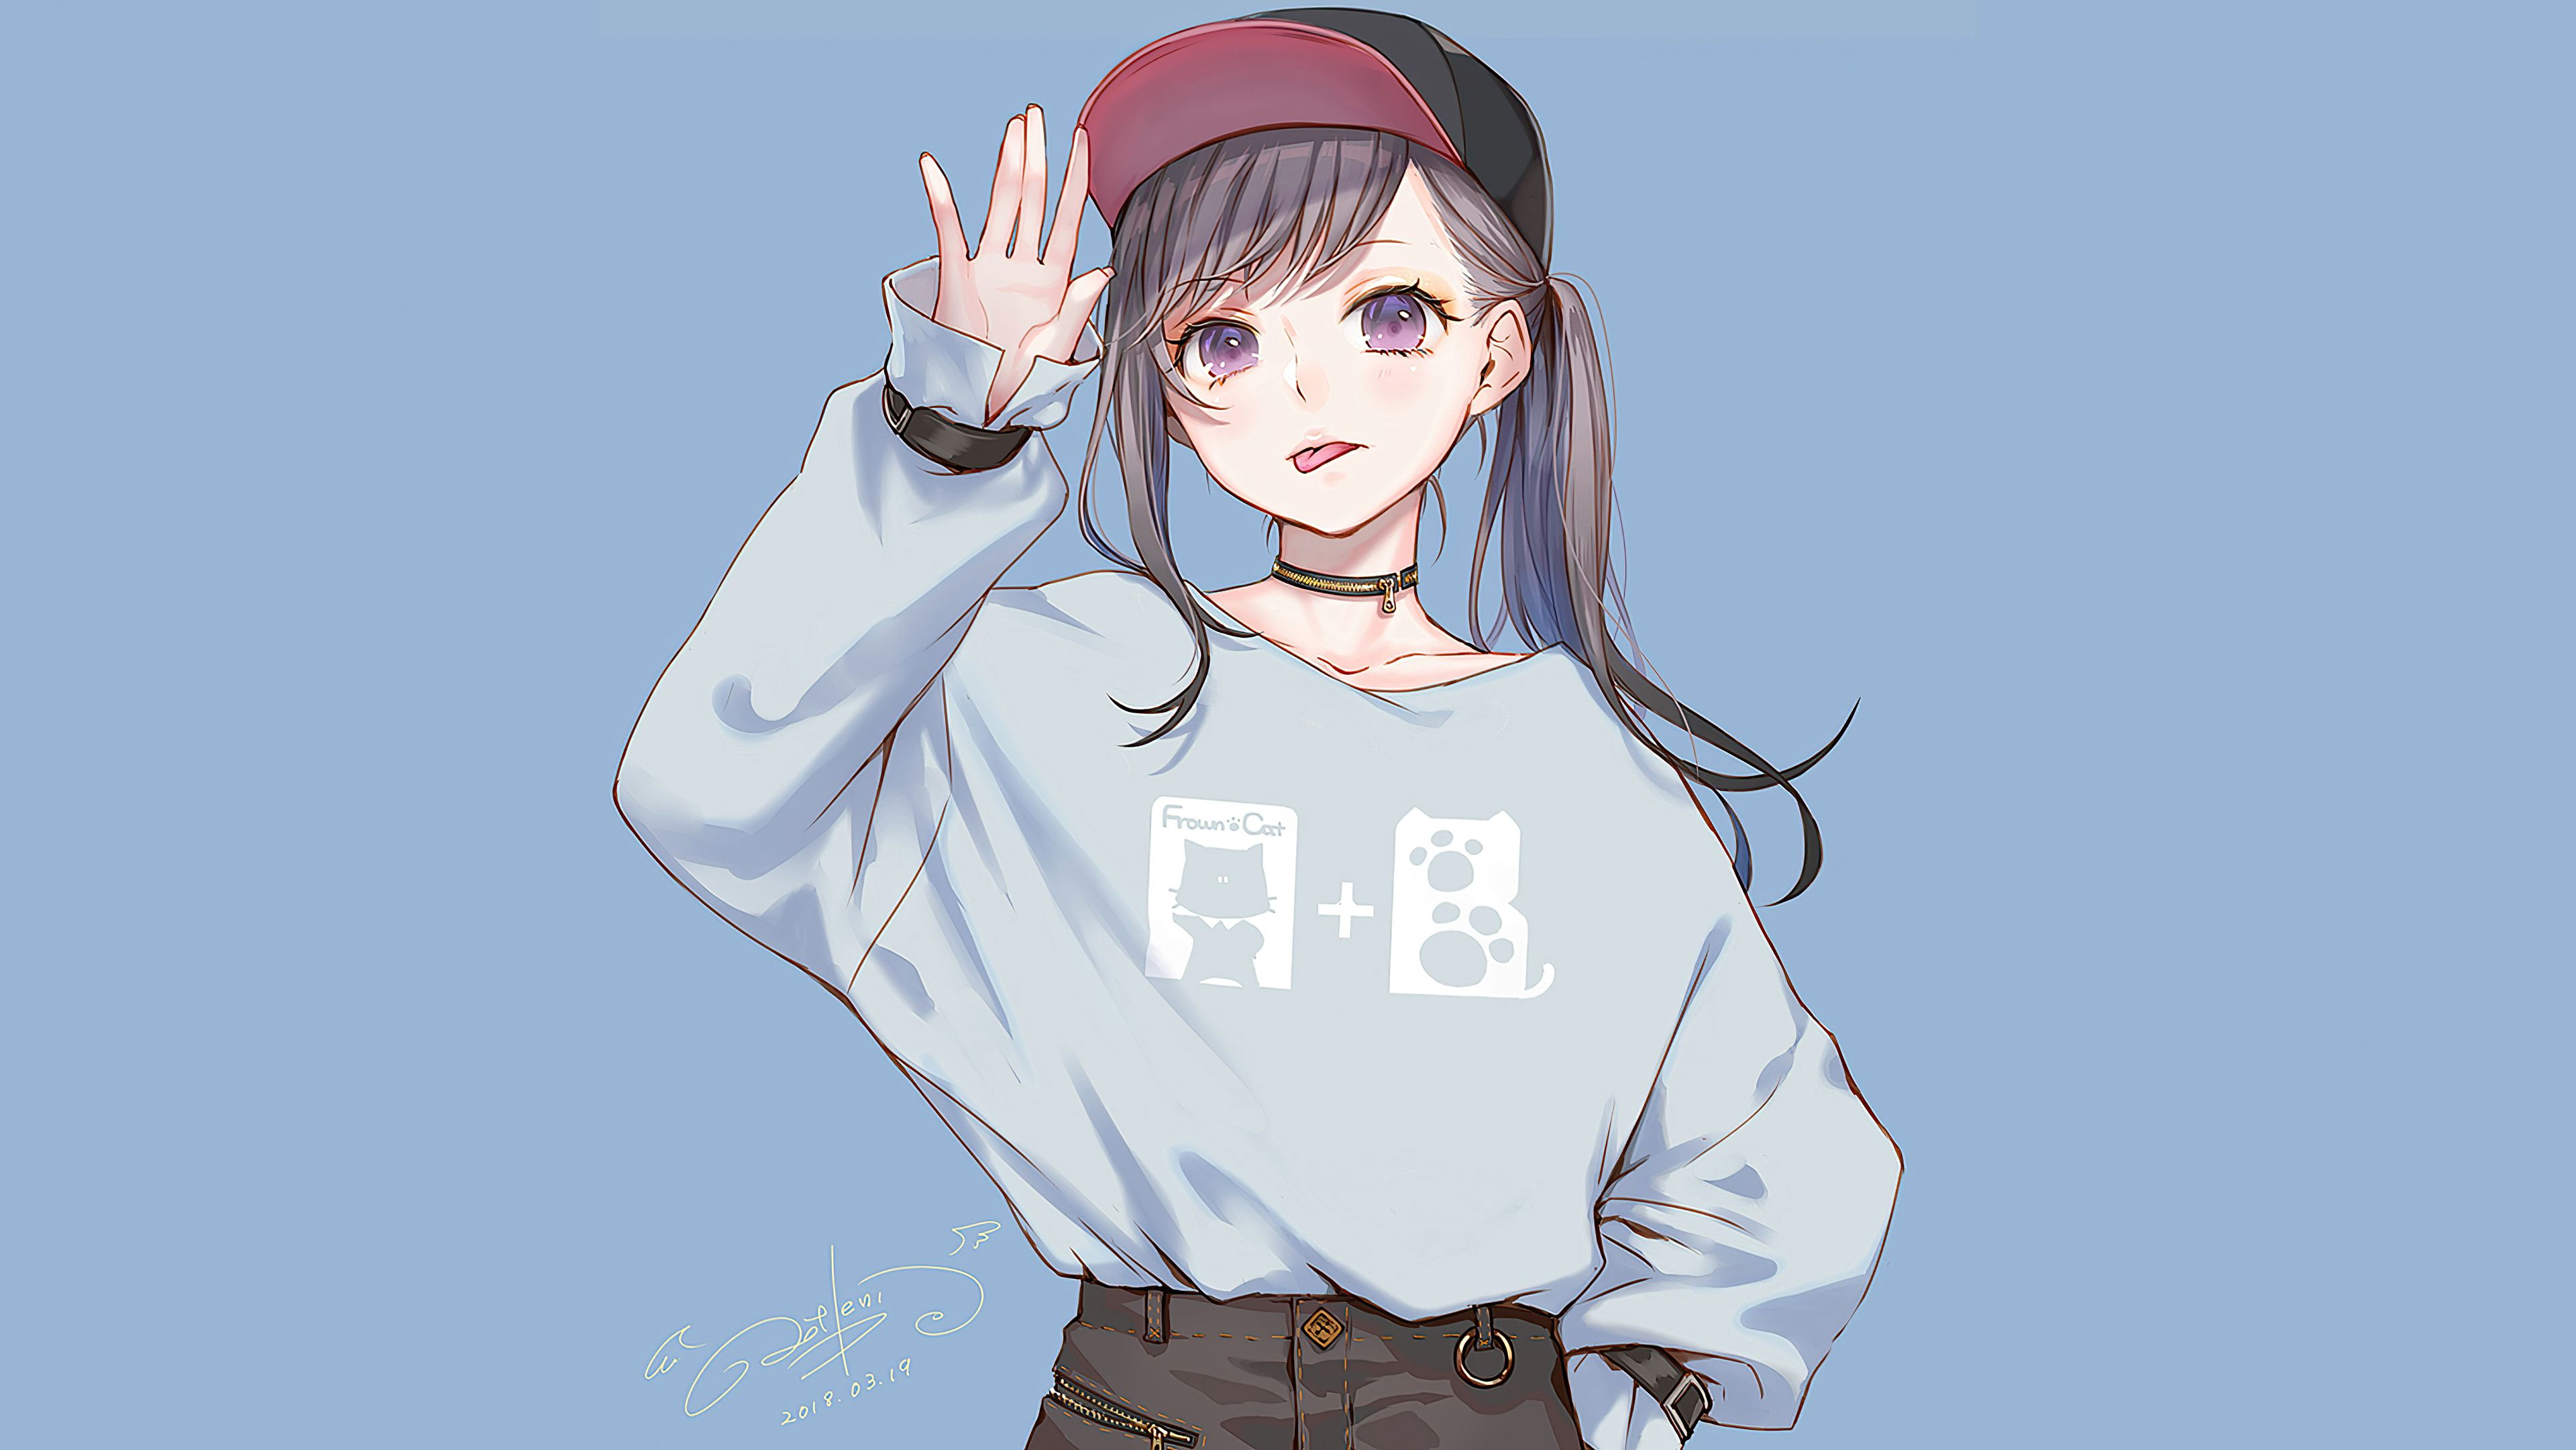 Pin Na Doske Anime Wallpapers 4k 19 wallpaper anime 4k